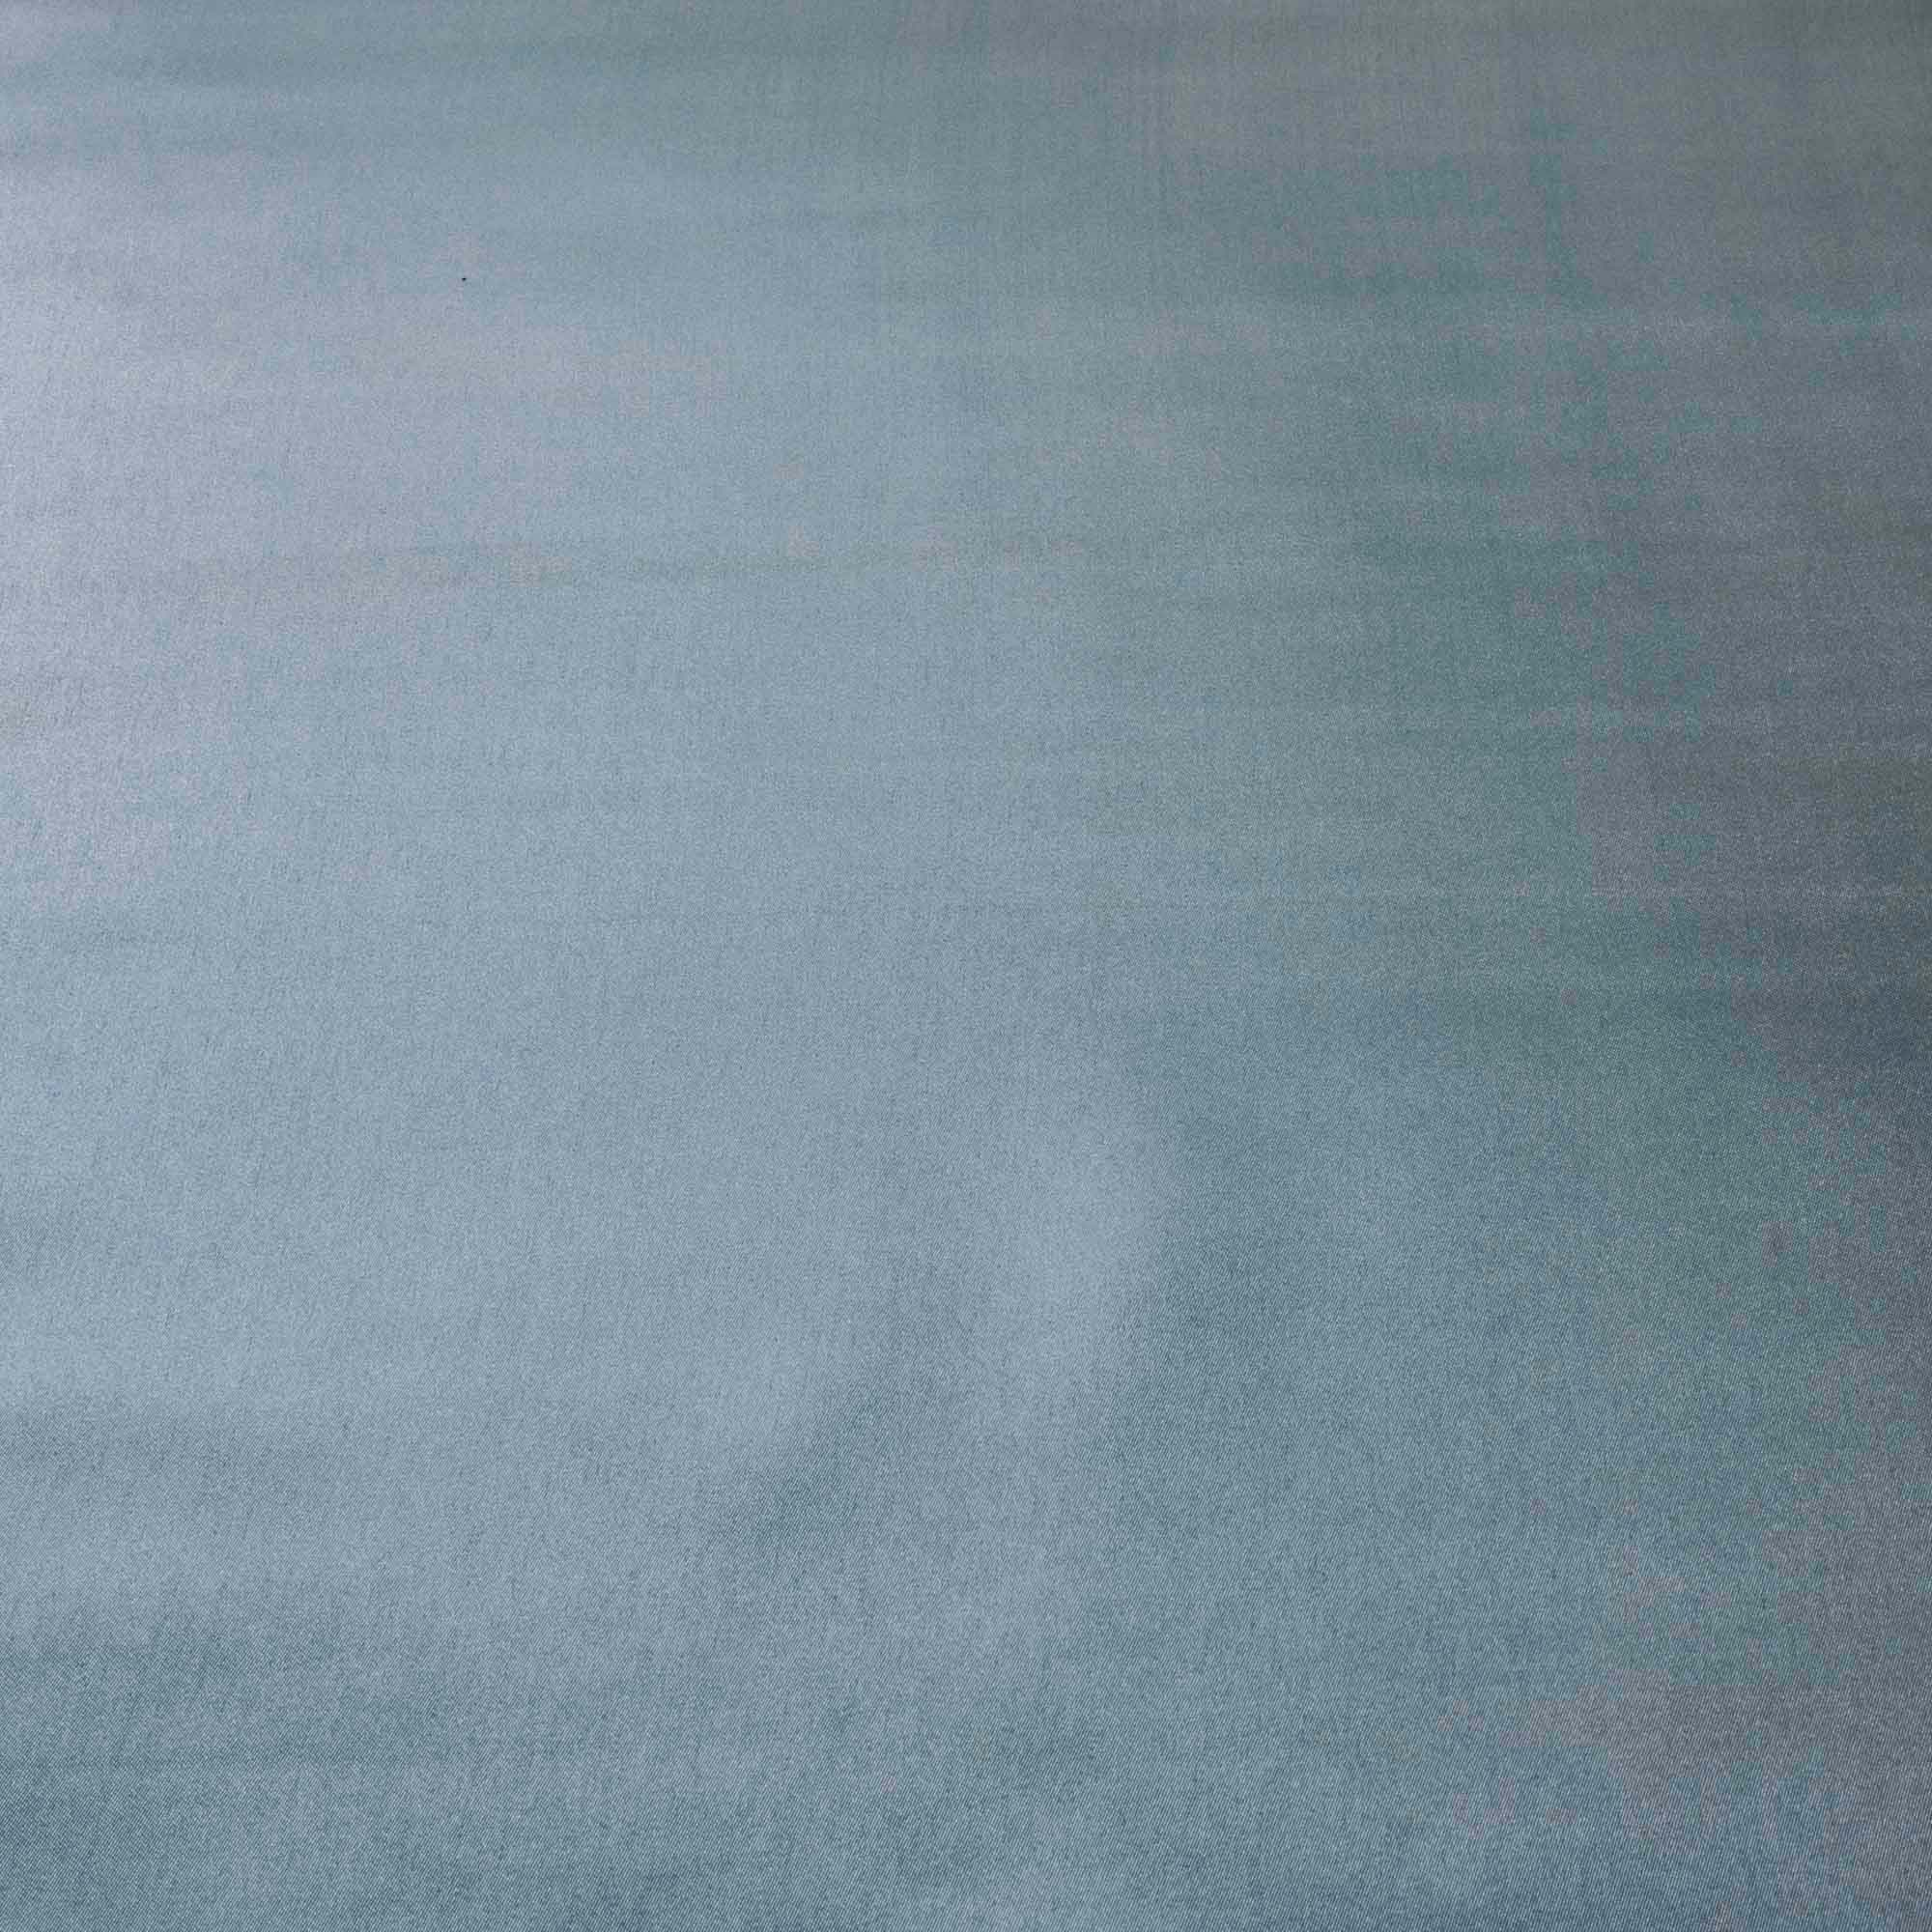 Tecido Cetim de Seda Charmeuse Azul Claro 1,50 Mt Largura